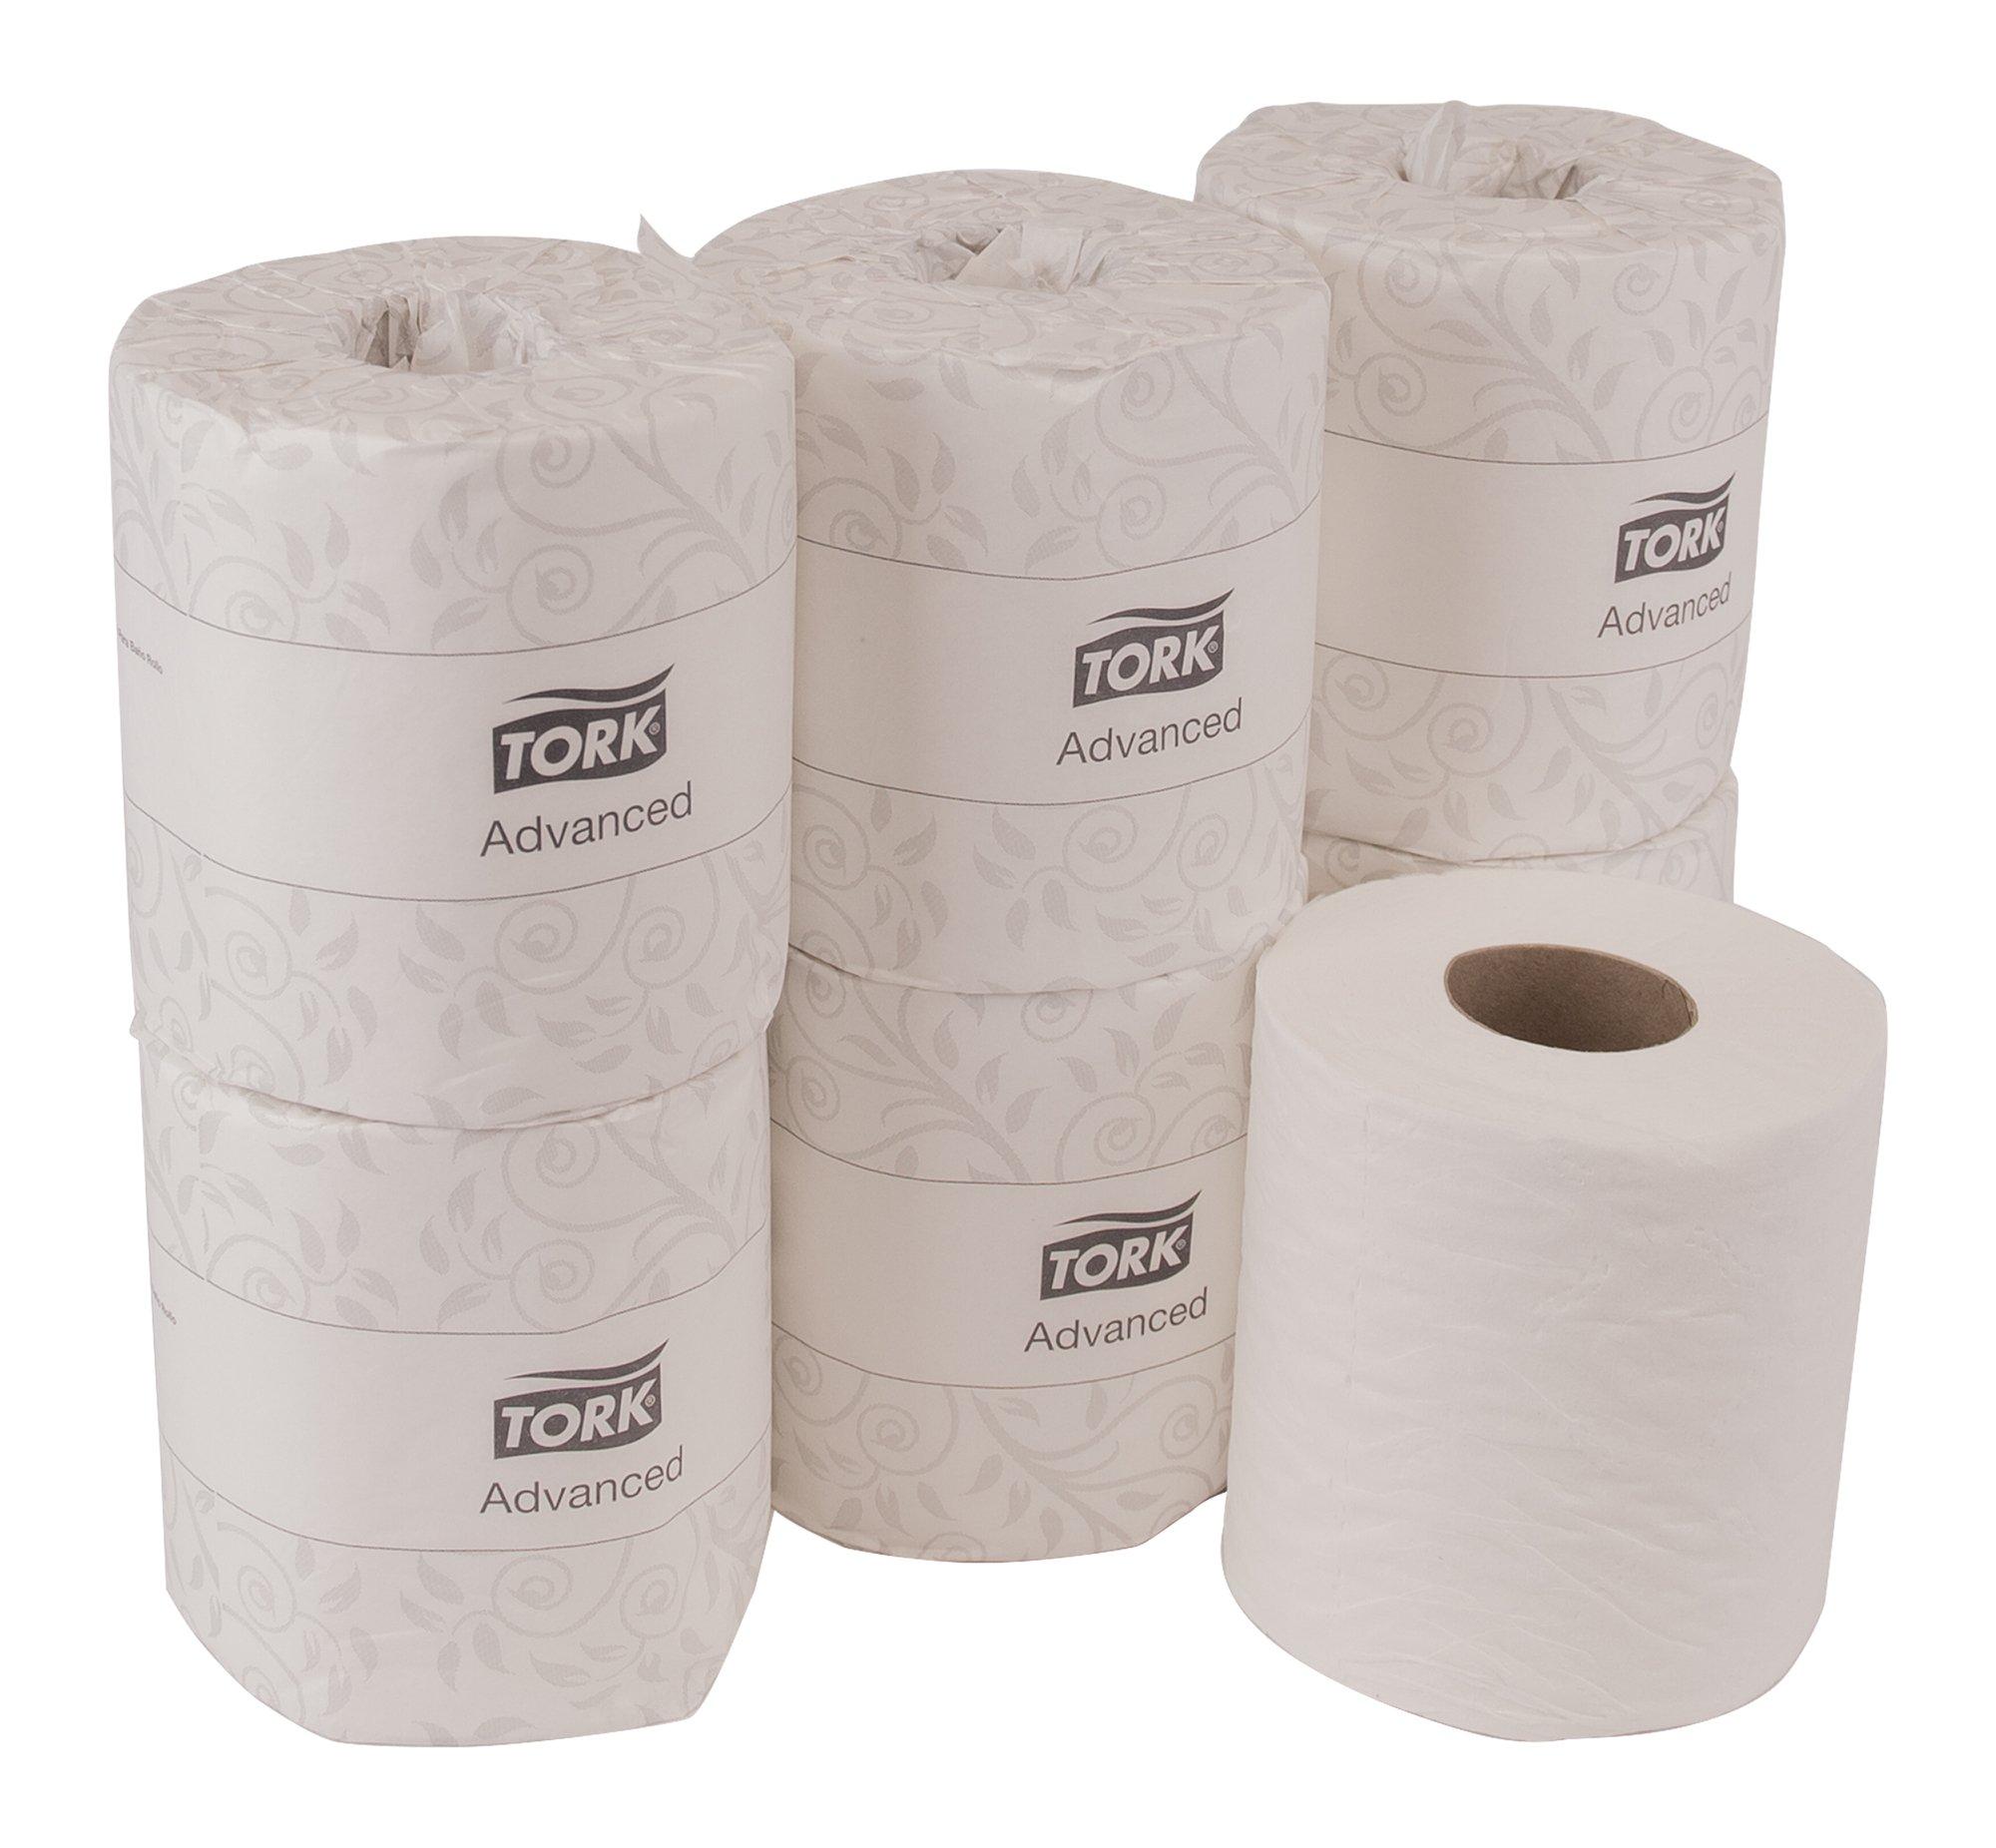 Tork Advanced TM6180 Soft Bath Tissue - rolls